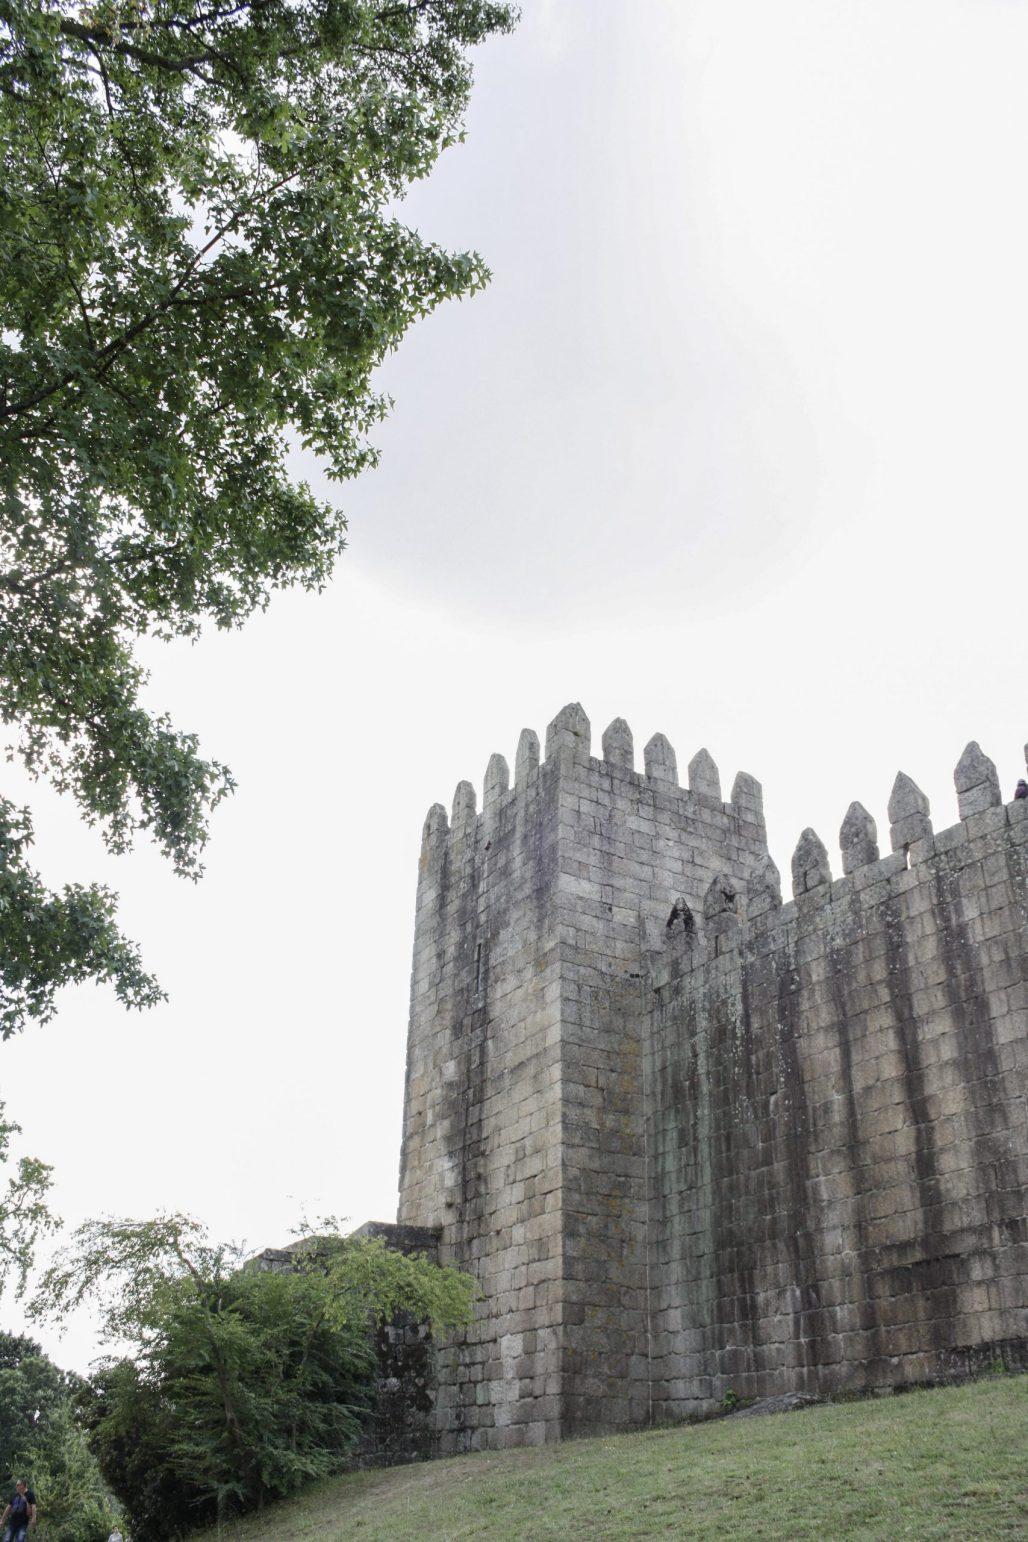 Traveling to ... the Castles of Guimarães :: Palacio dos Duques & Castelo Guimarães | Dreamery Events